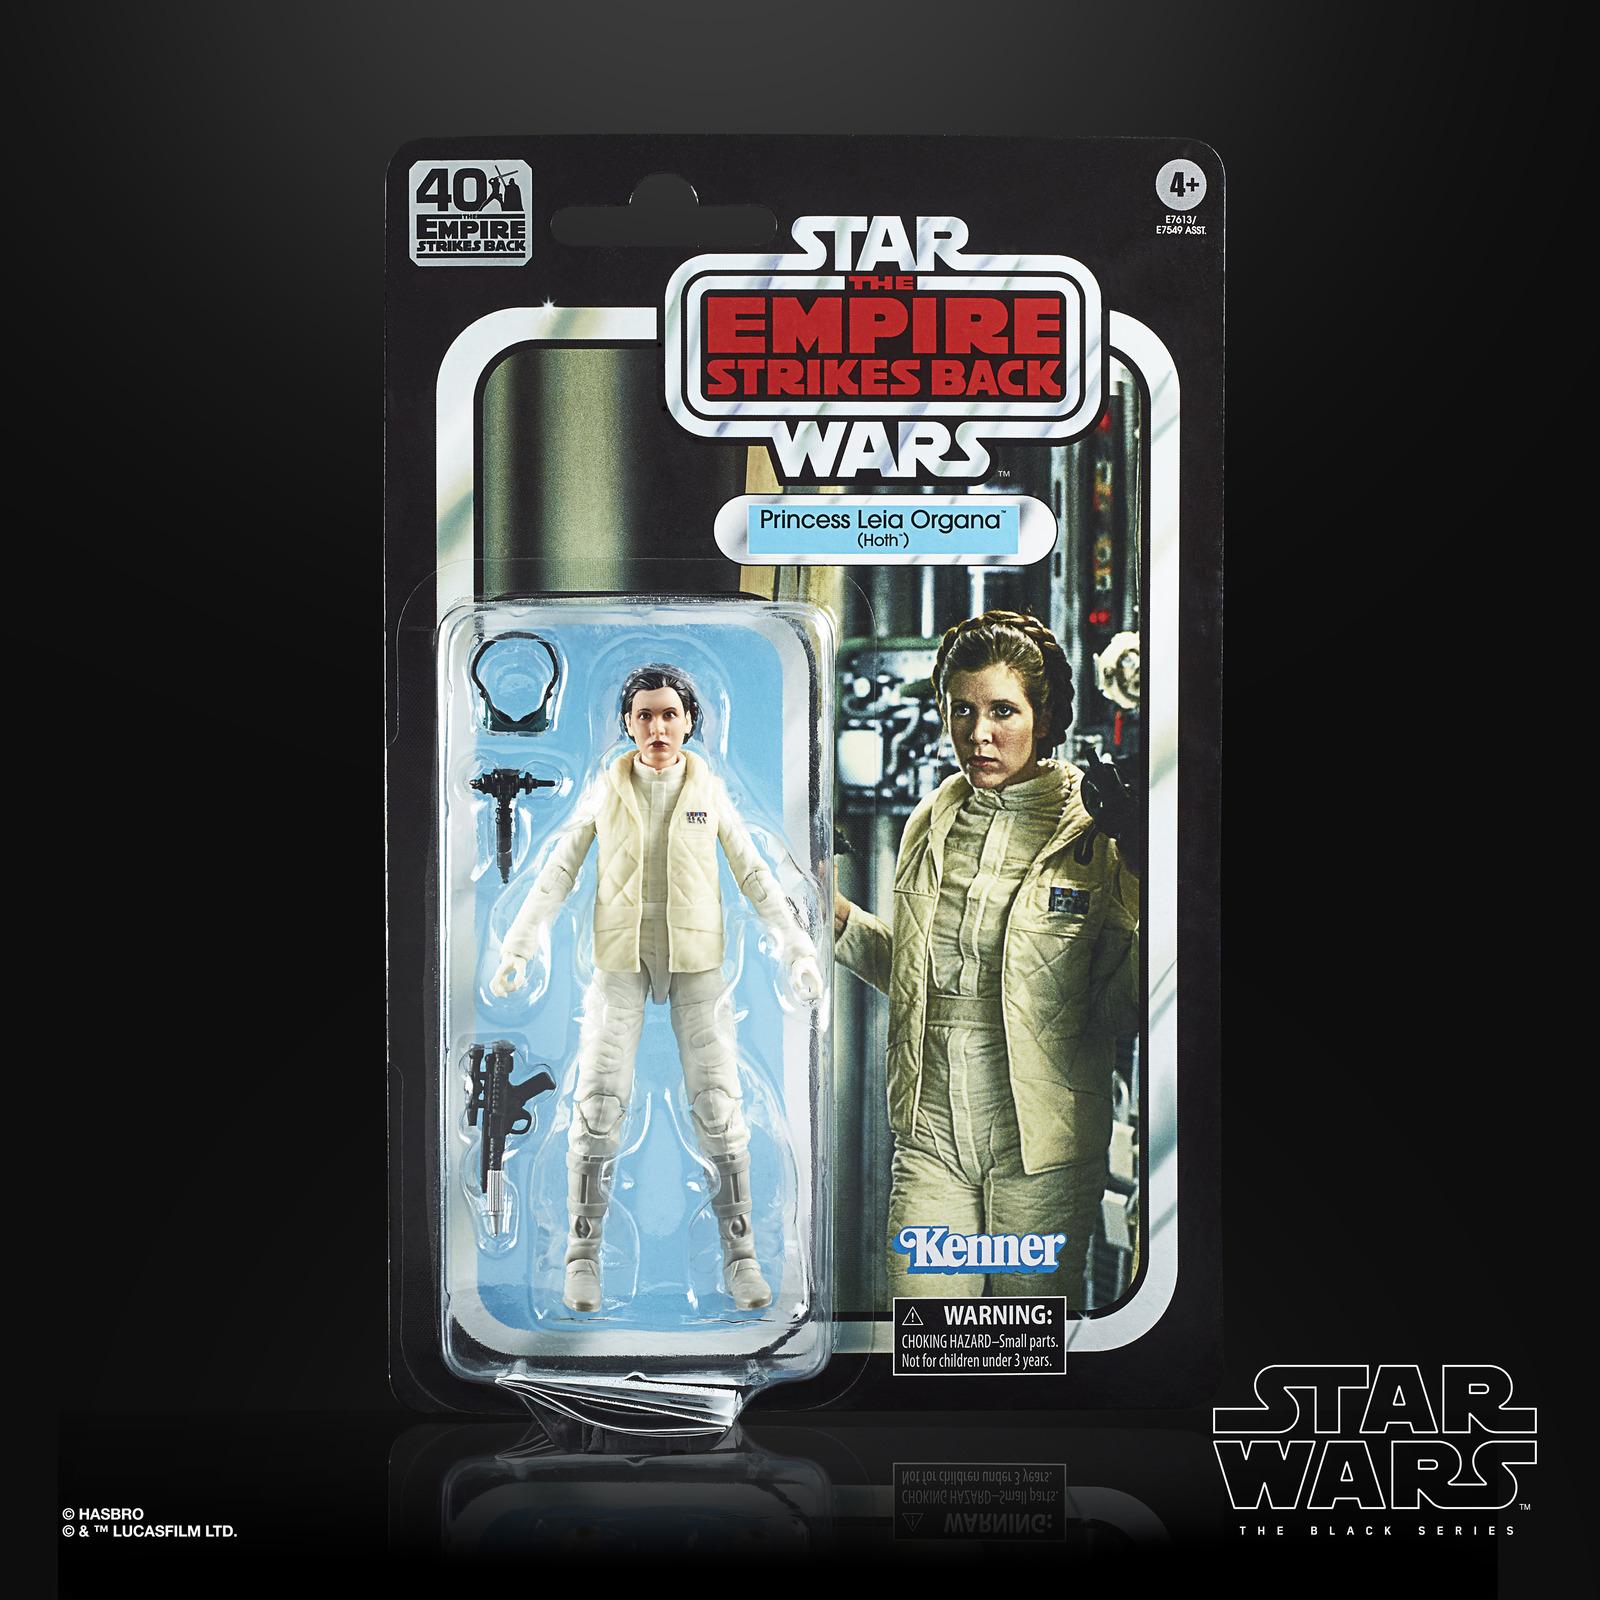 Star Wars: The Black Series Vintage Figure - Princess Leia Organa (Hoth) image